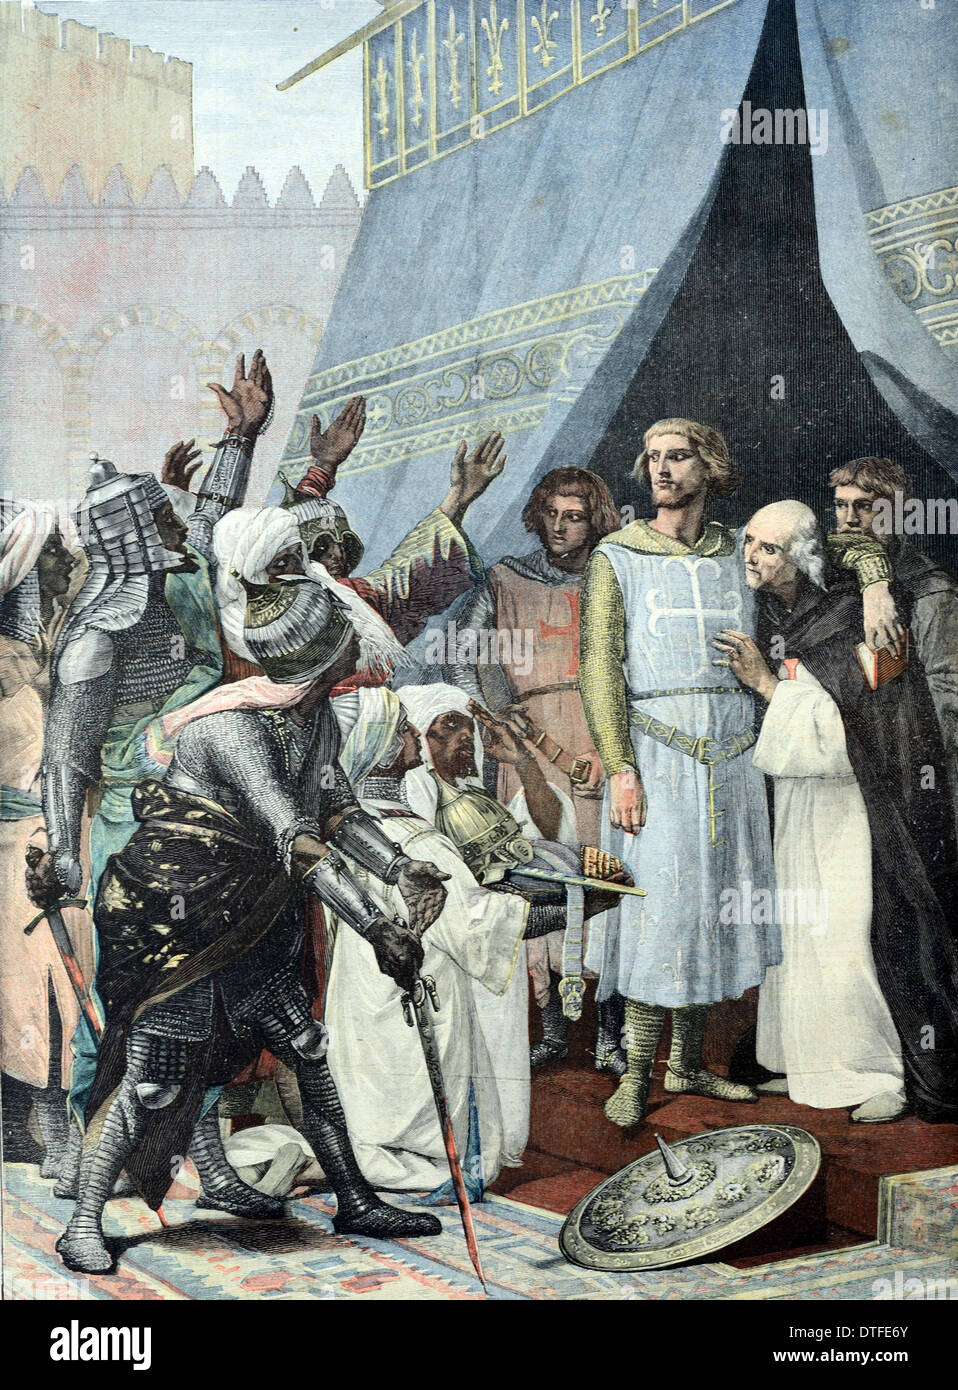 Saint Louis IX Catholic Saint & King of France (1214-1270) in Jerusalem during Seventh Crusade (c1248) - Stock Image